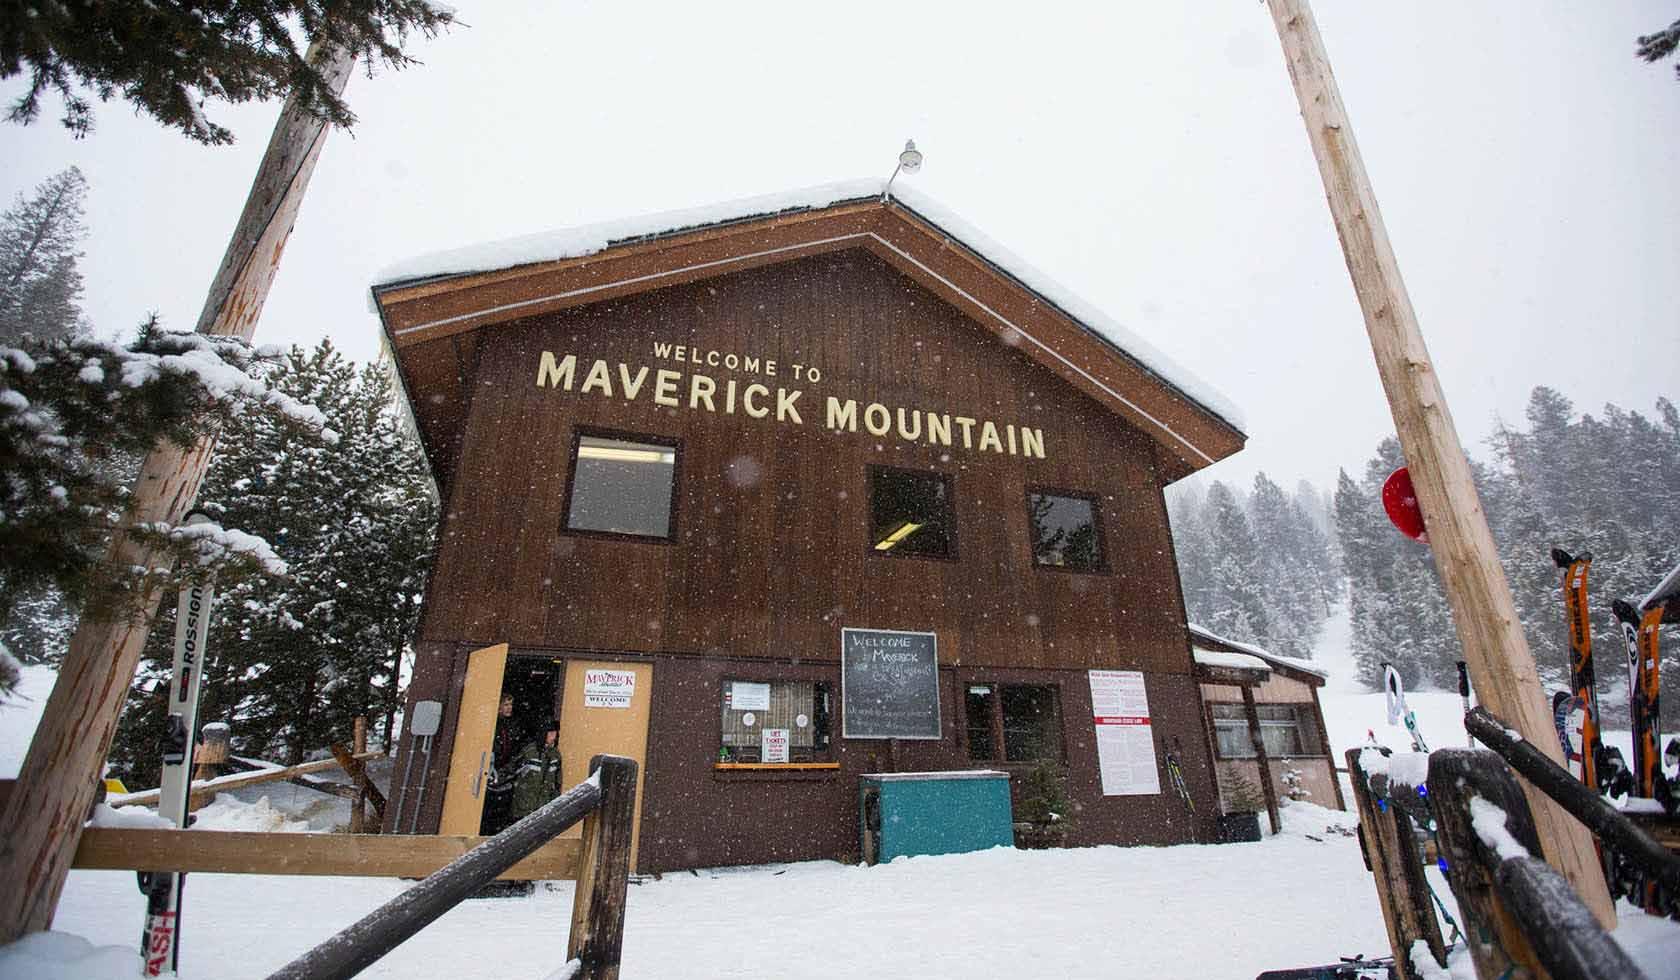 Maverick Mountain